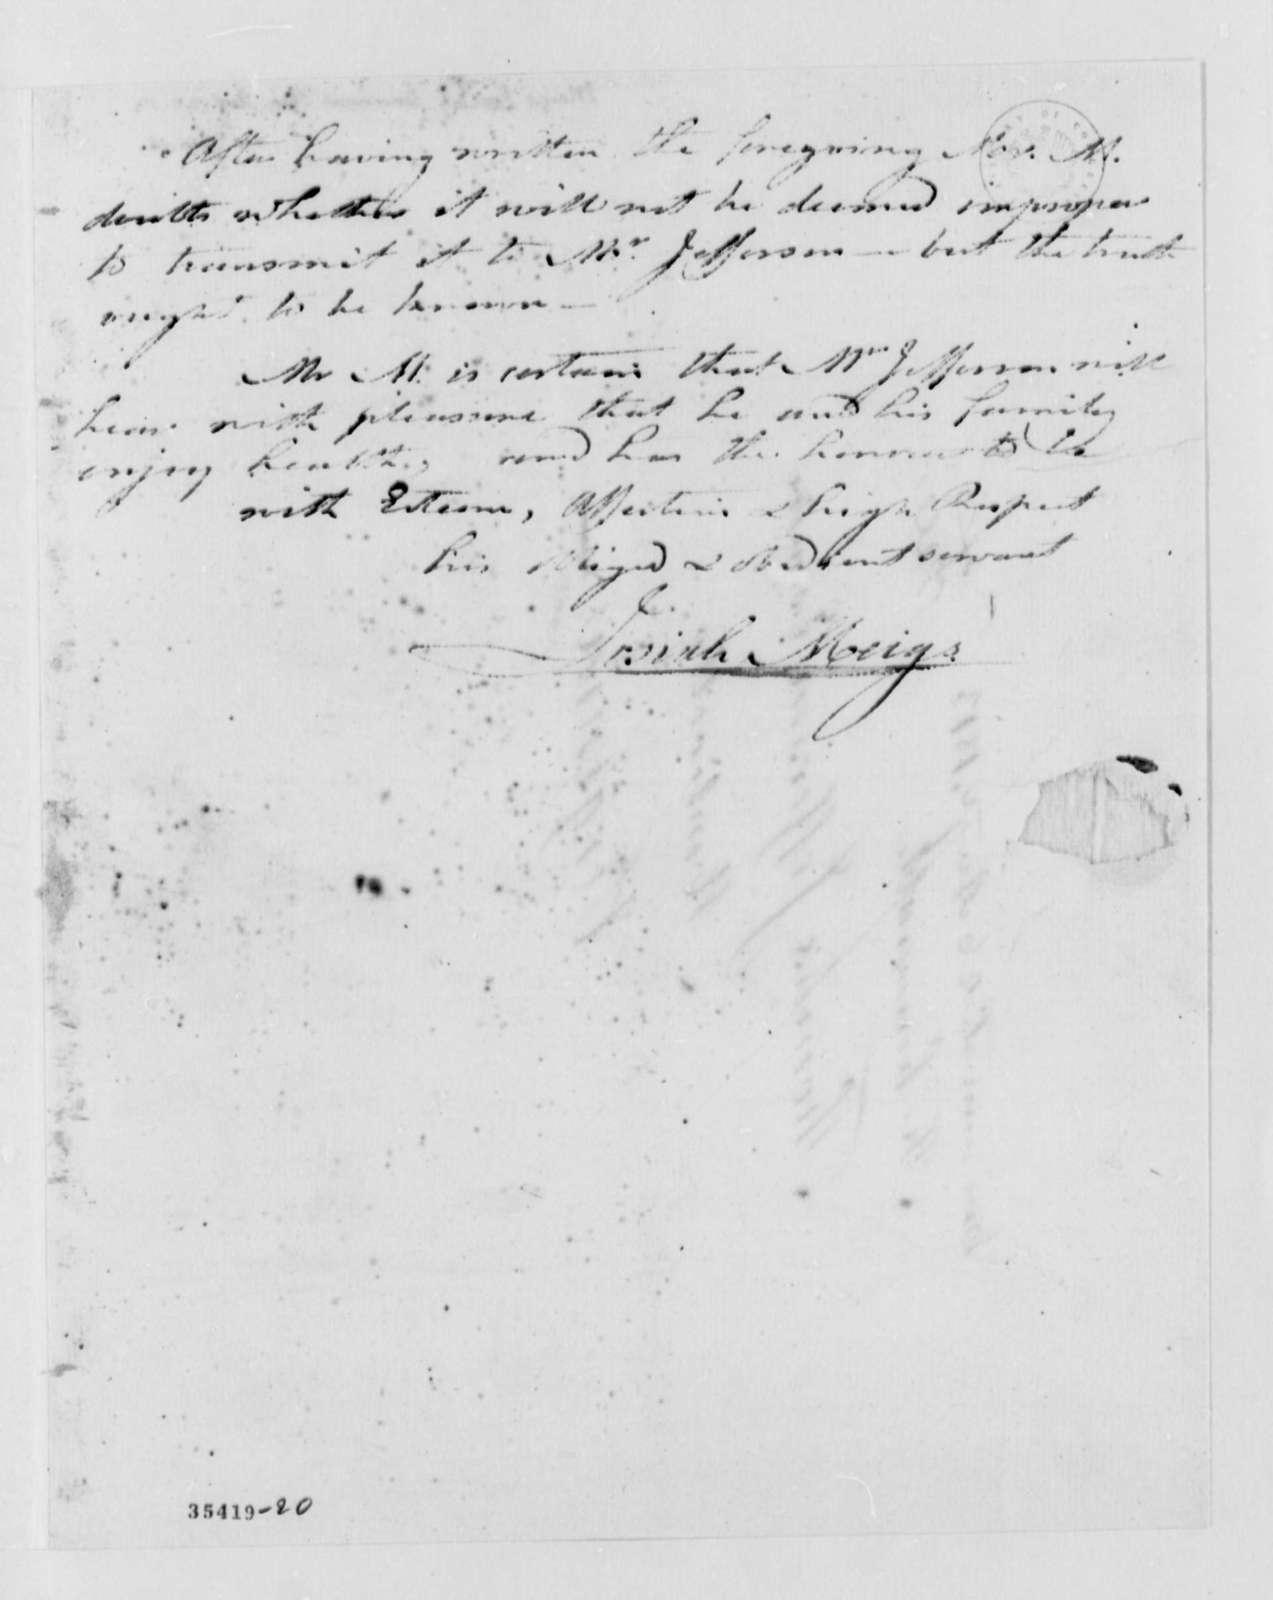 Josiah Meigs to Thomas Jefferson, August 25, 1813